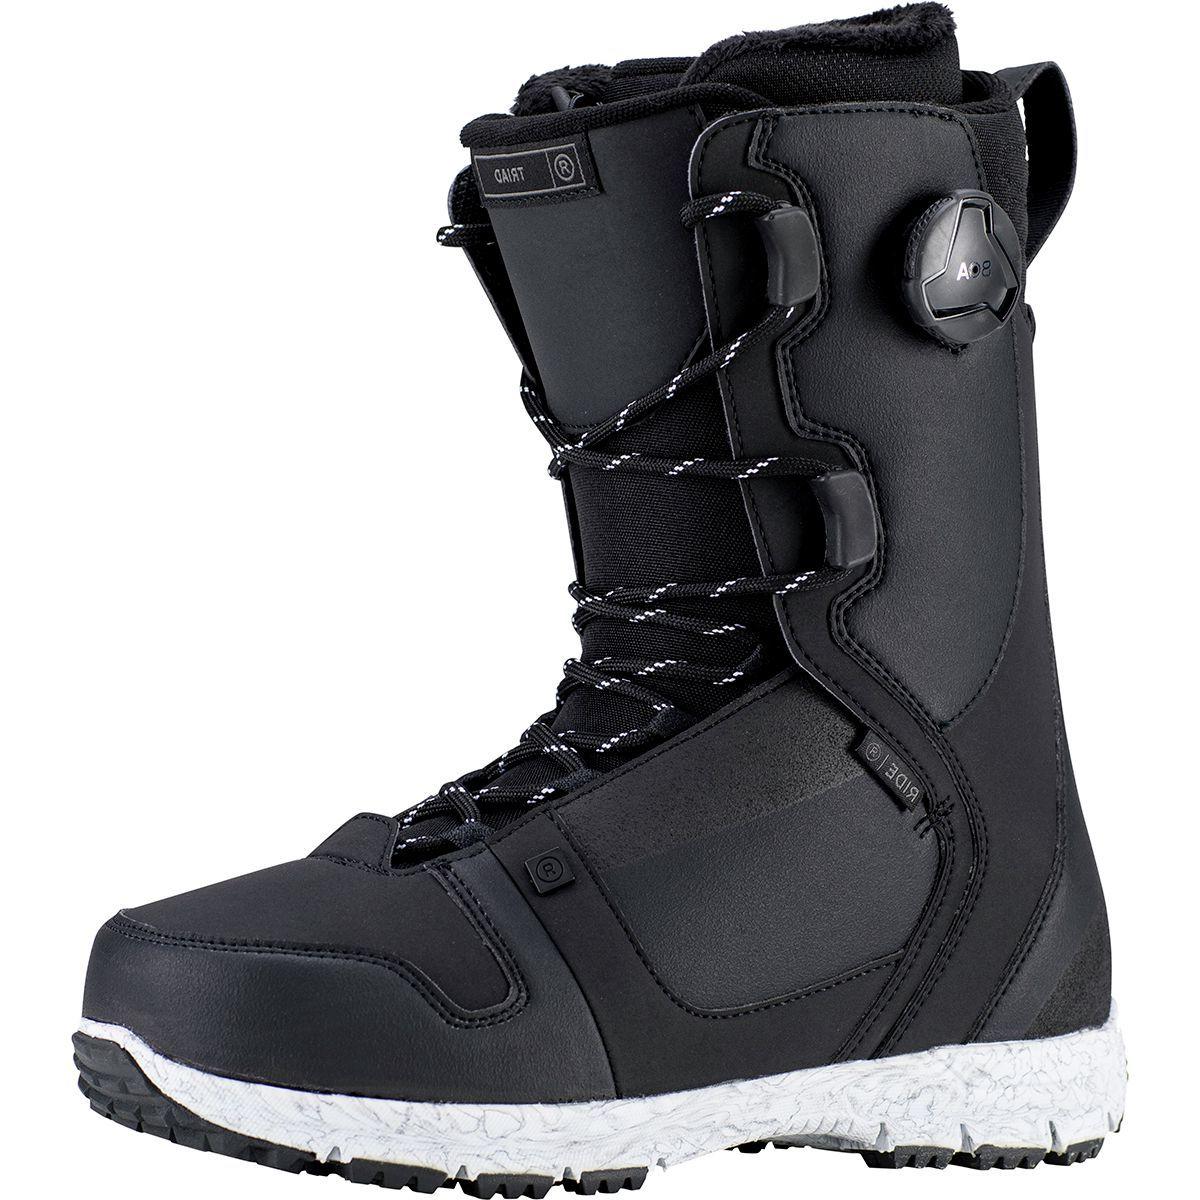 Ride Triad Snowboard Boot - Men's